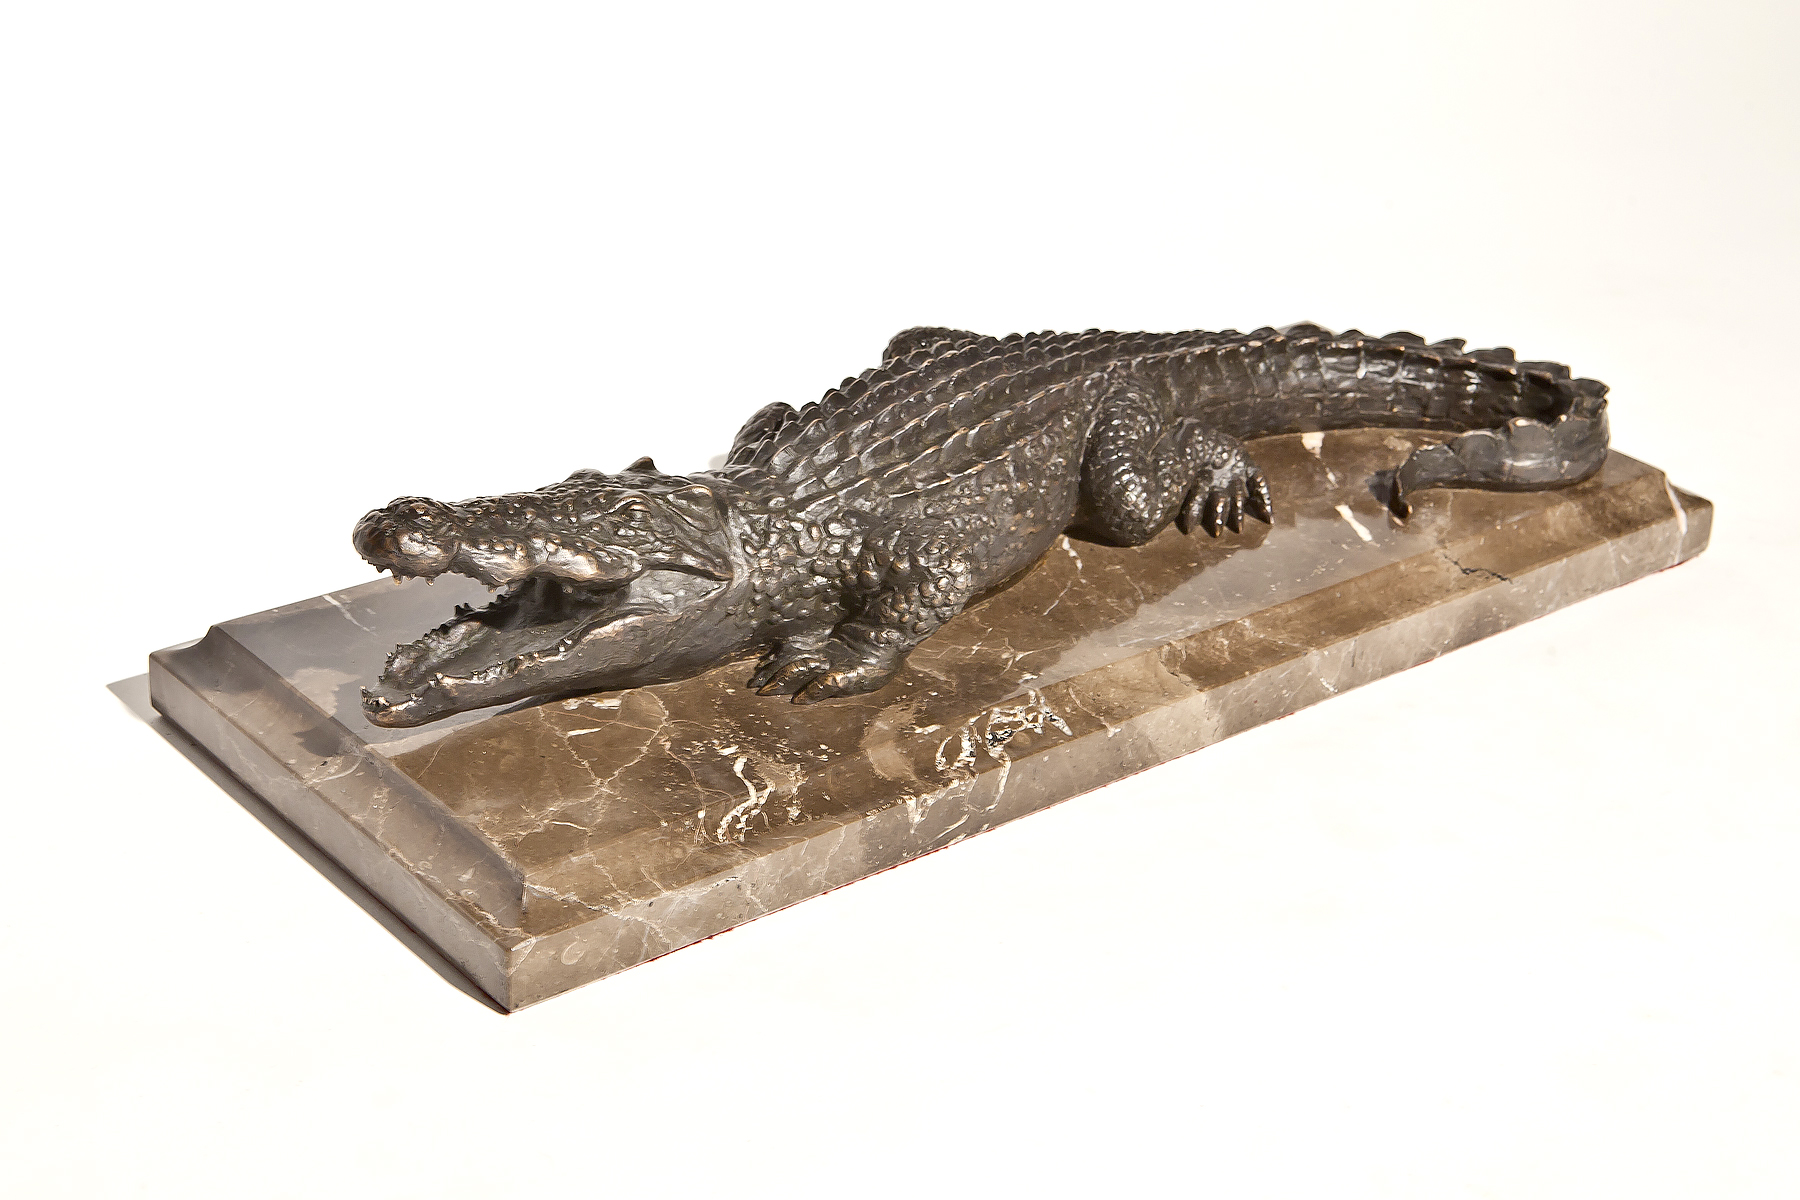 Скульптура «Крокодил» (бронза, мрамор или гранит)